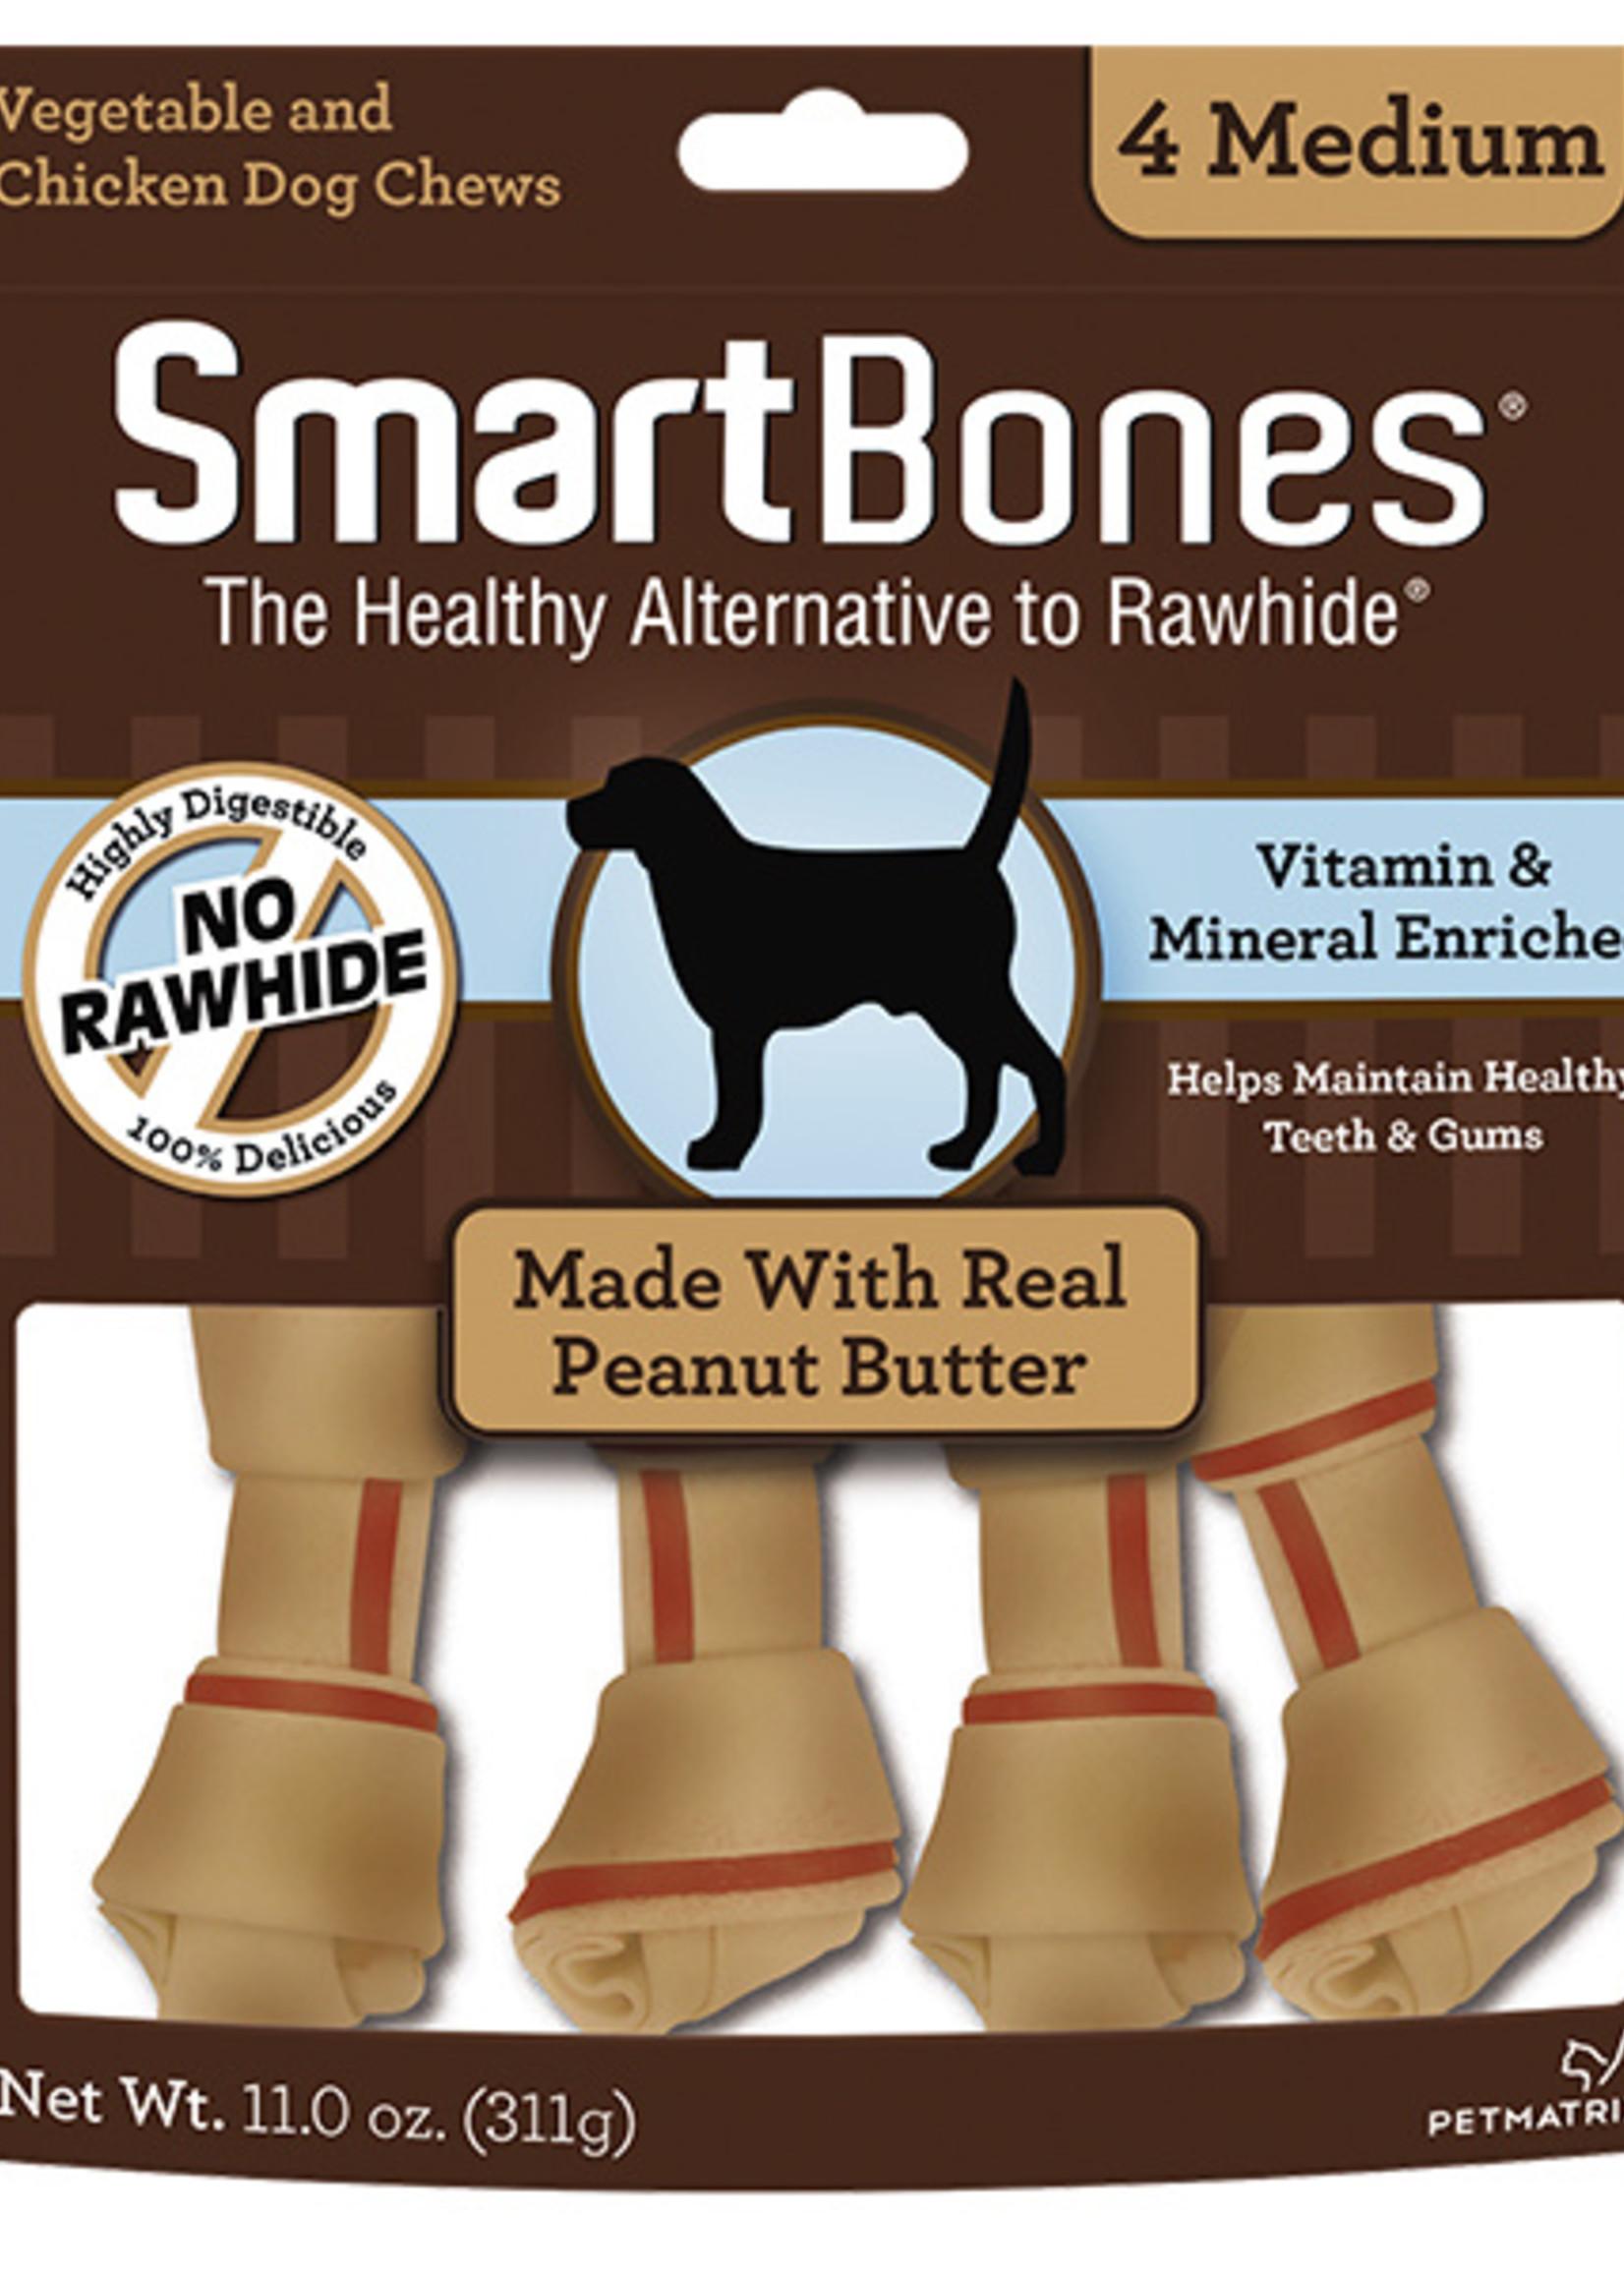 SmartBones Smartbones Peanut Butter 4 Med